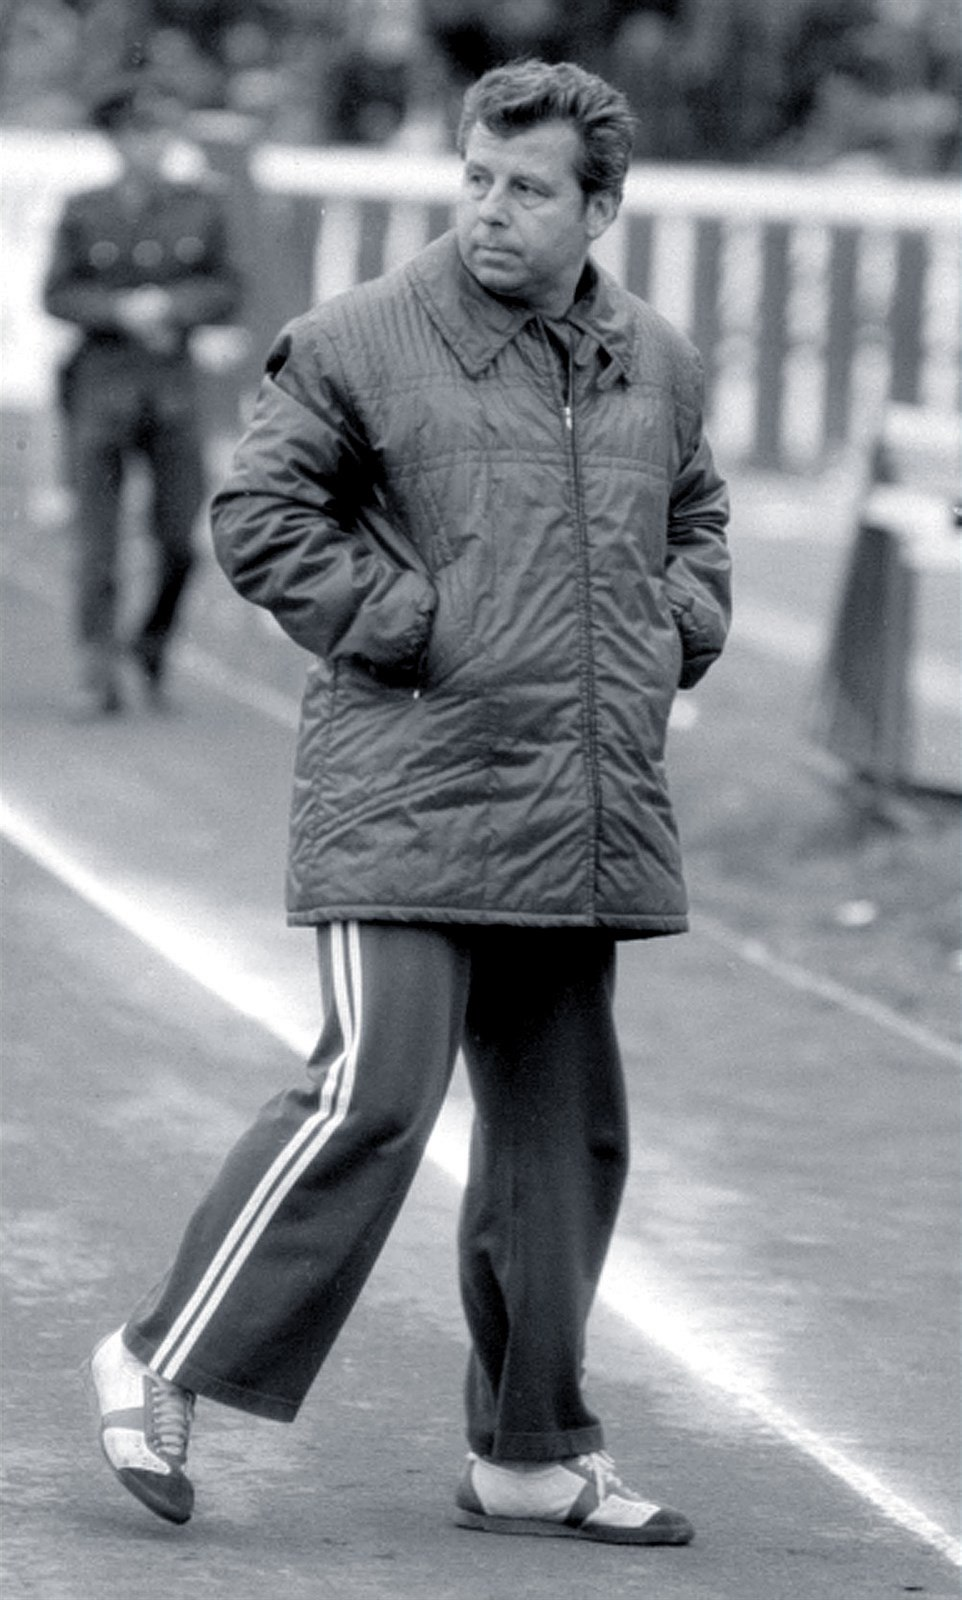 Fotogalerie B½val½ reprezentant Josef Masopust v pozici